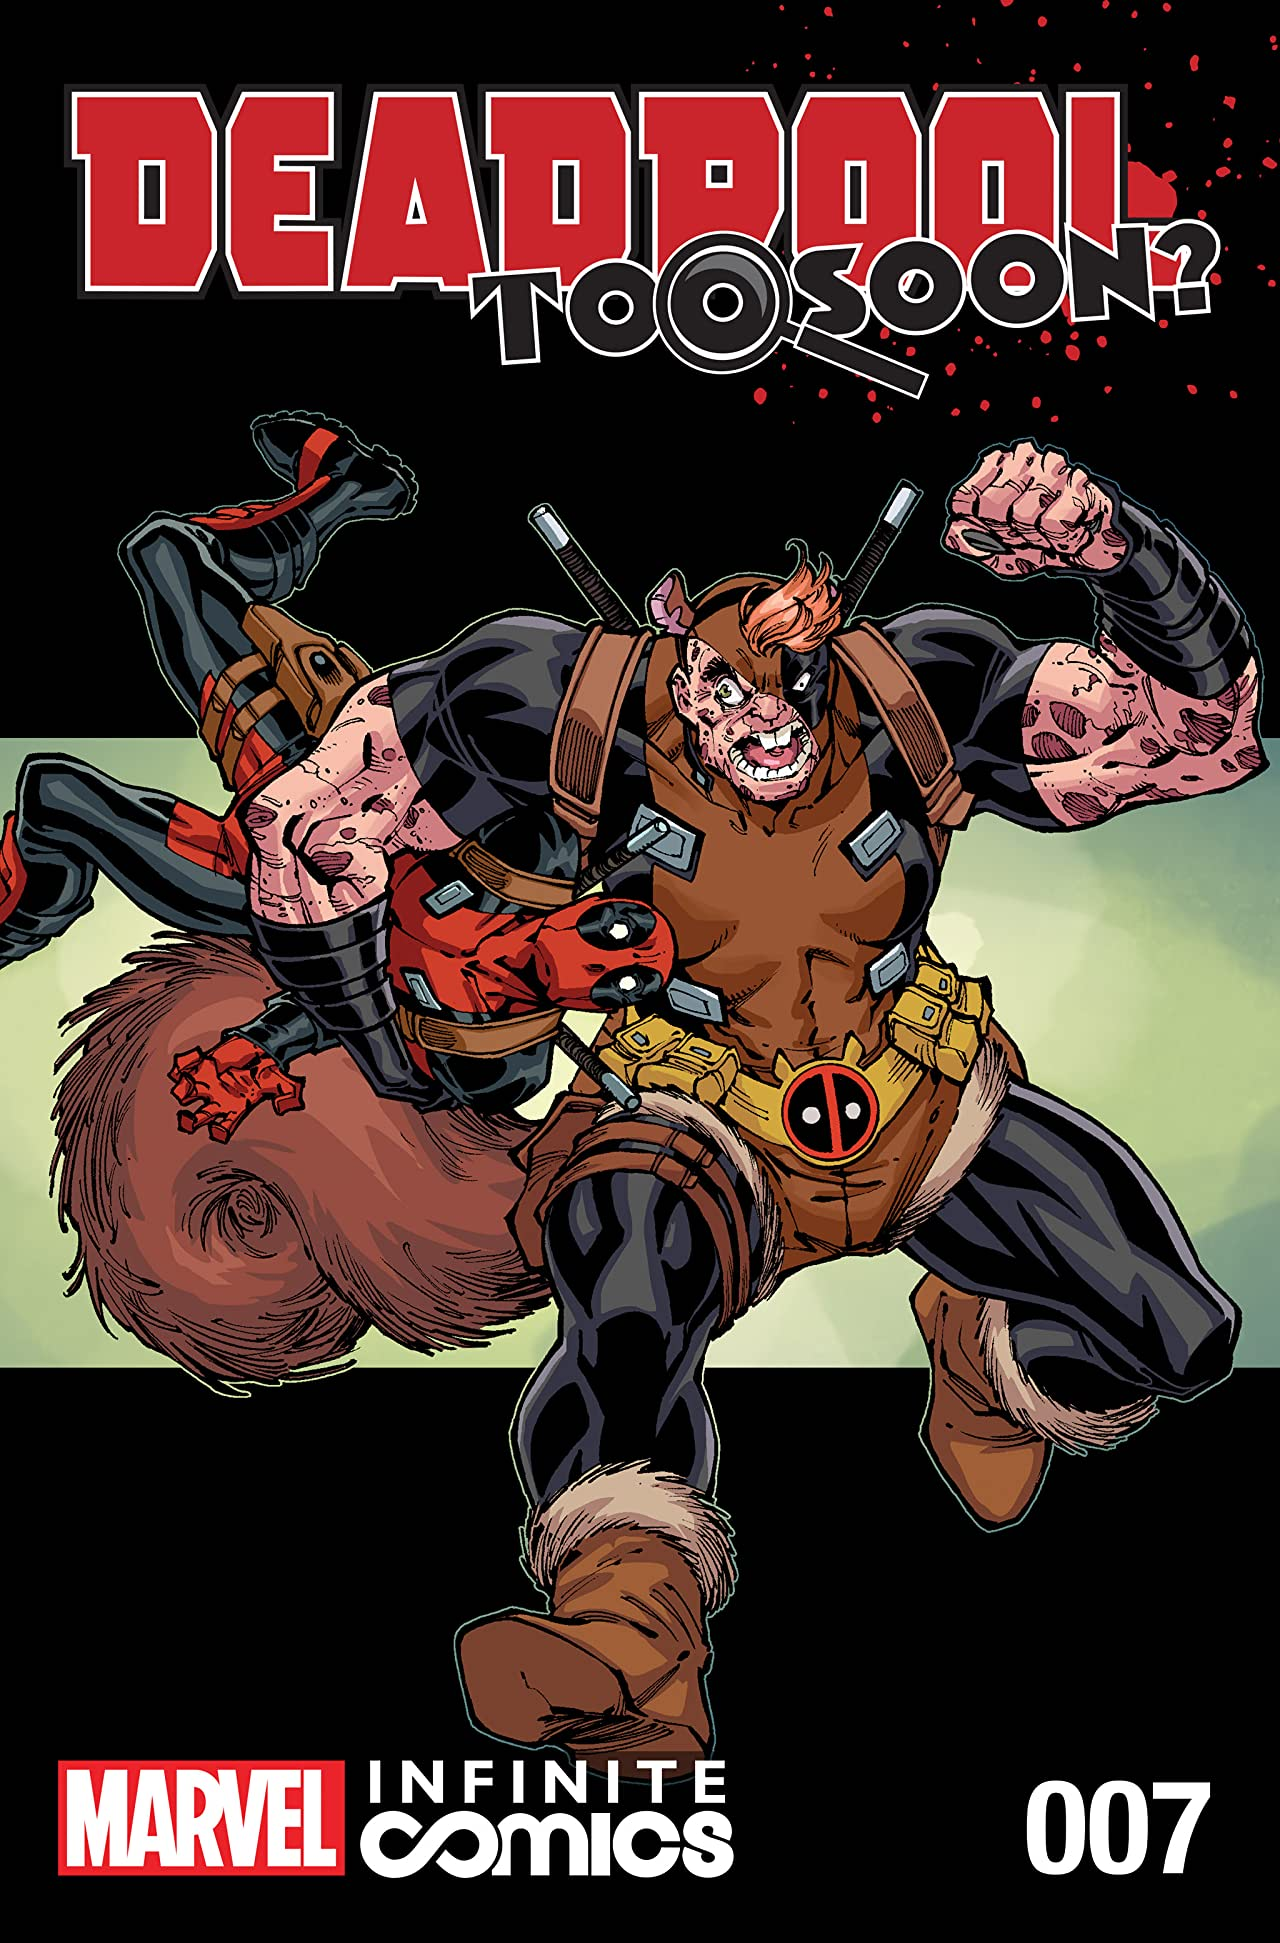 Deadpool: Too Soon? Infinite Comic #7 (of 8)